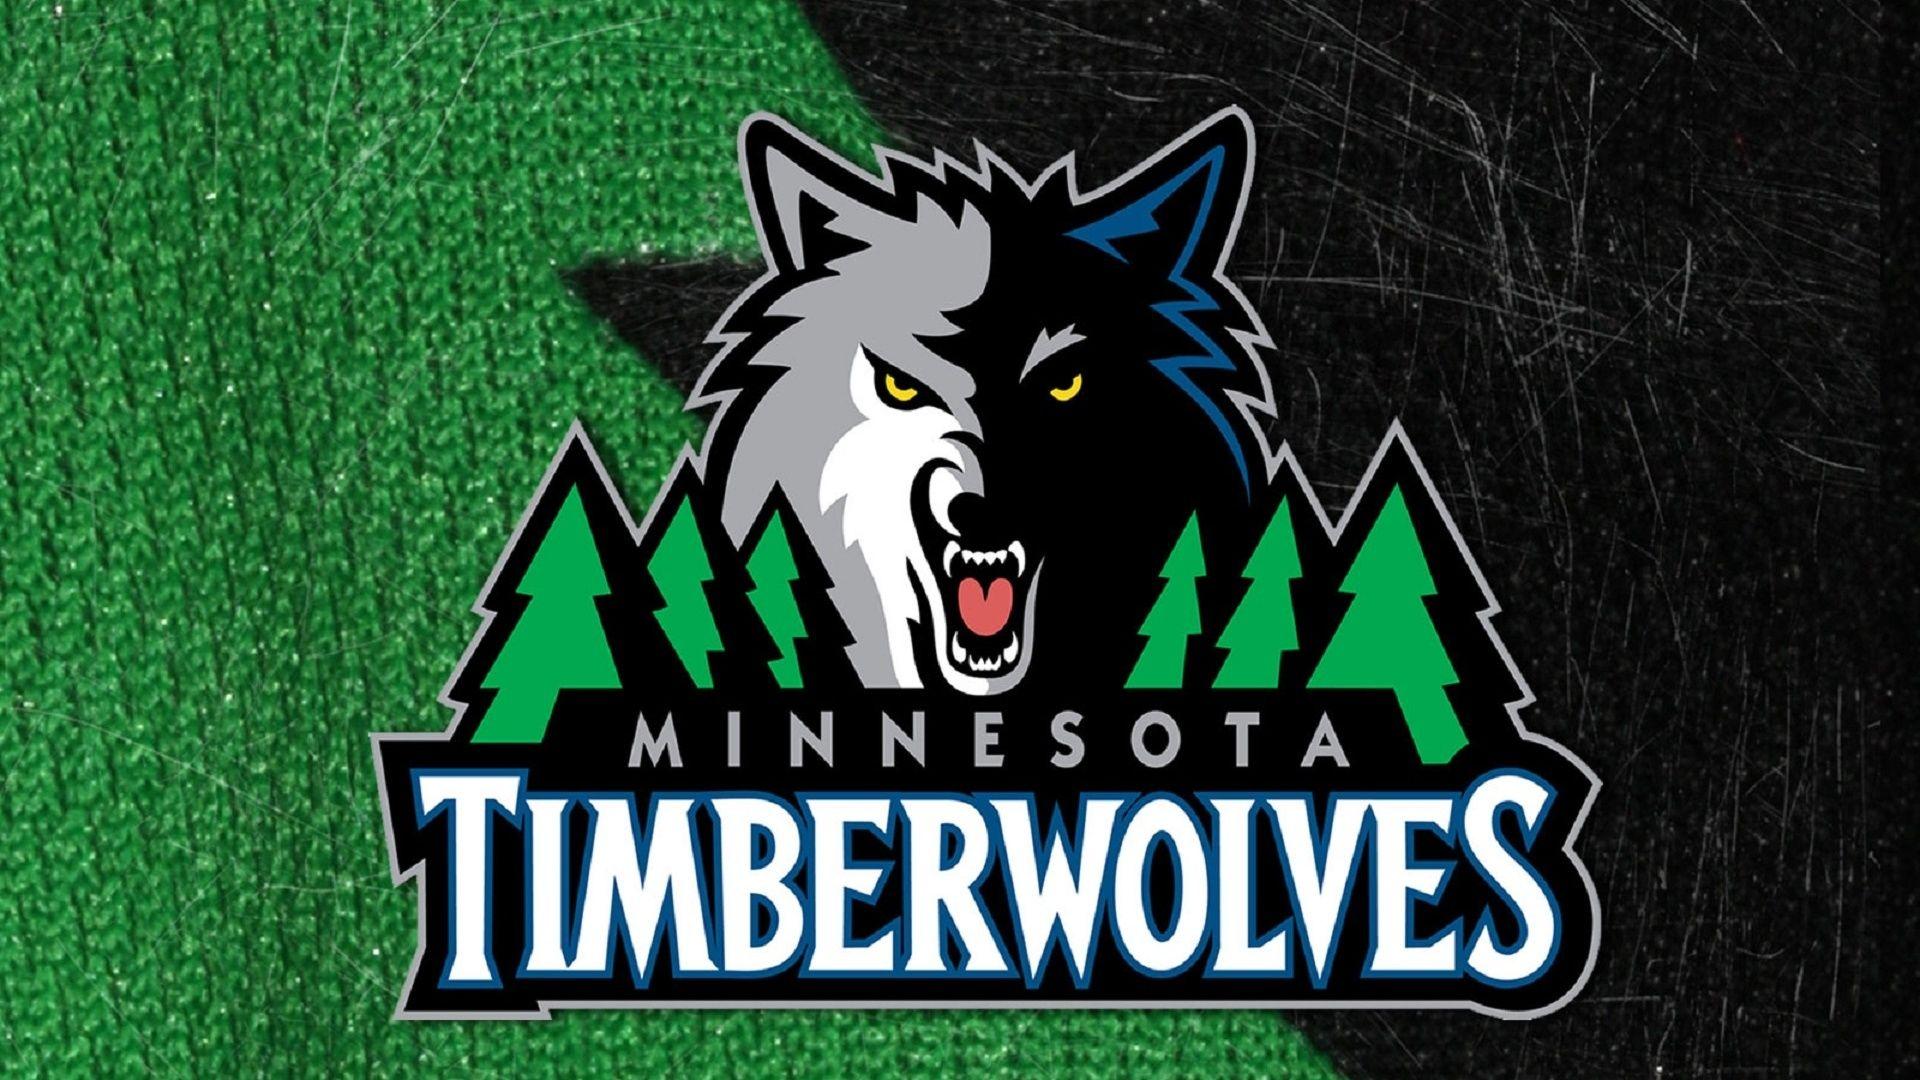 Minnesota Timberwolves Svg Nba Svg Husband Gift Gift For Etsy Minnesota Timberwolves Basketball Nba Logo Minnesota Timberwolves